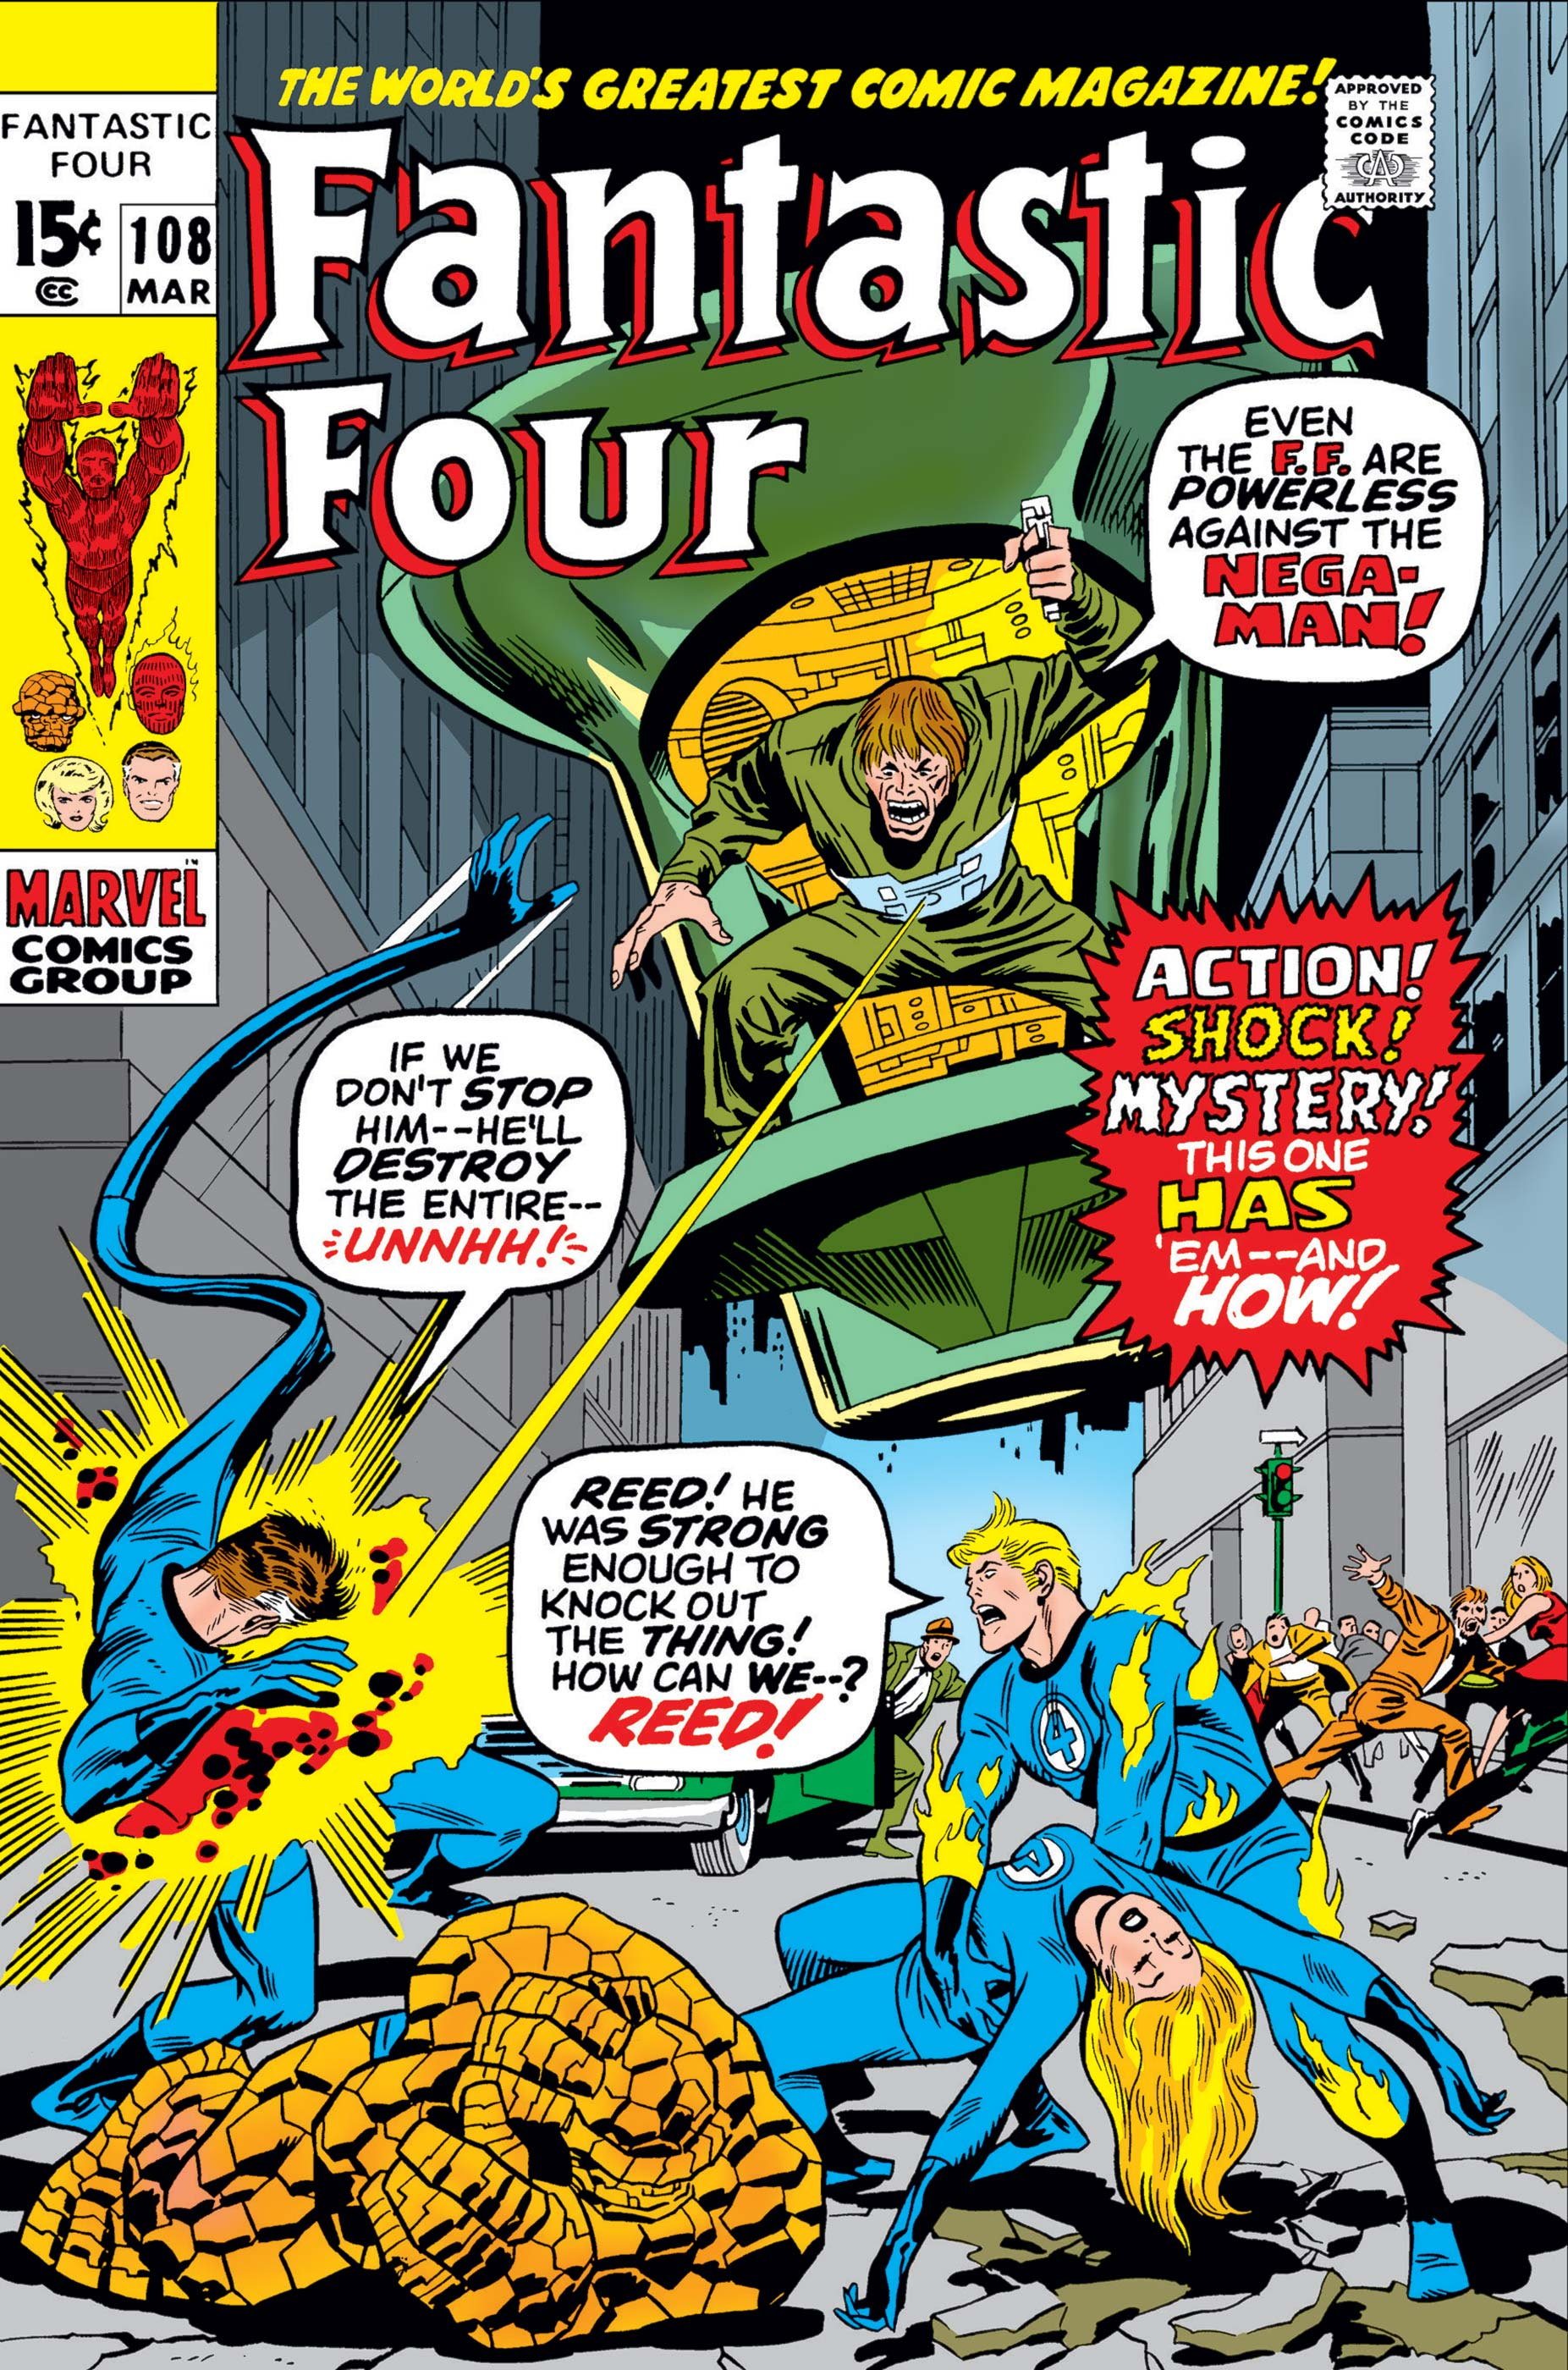 Fantastic Four (1961) #108